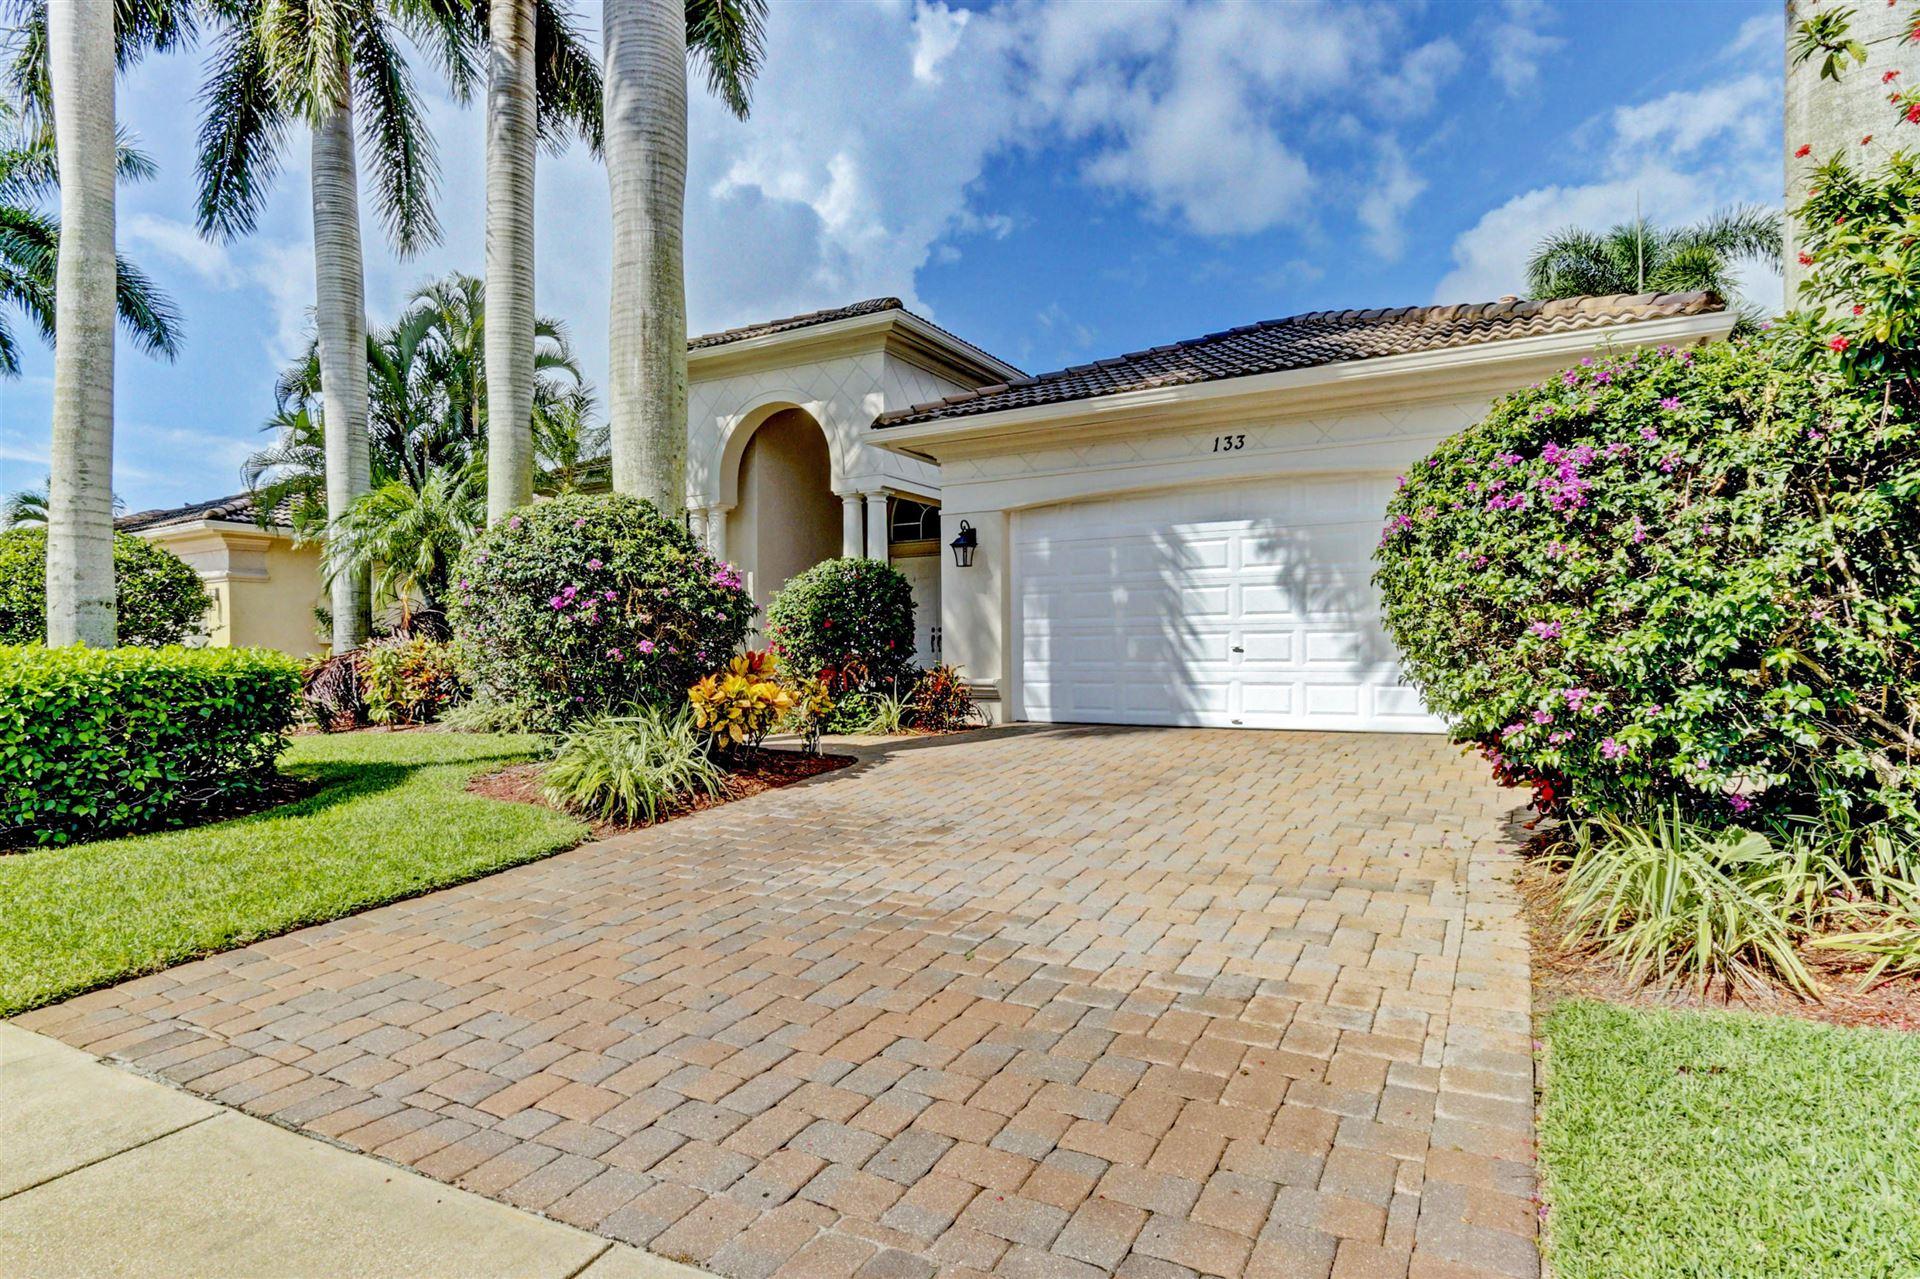 Photo of 133 Abondance Drive, Palm Beach Gardens, FL 33410 (MLS # RX-10660041)